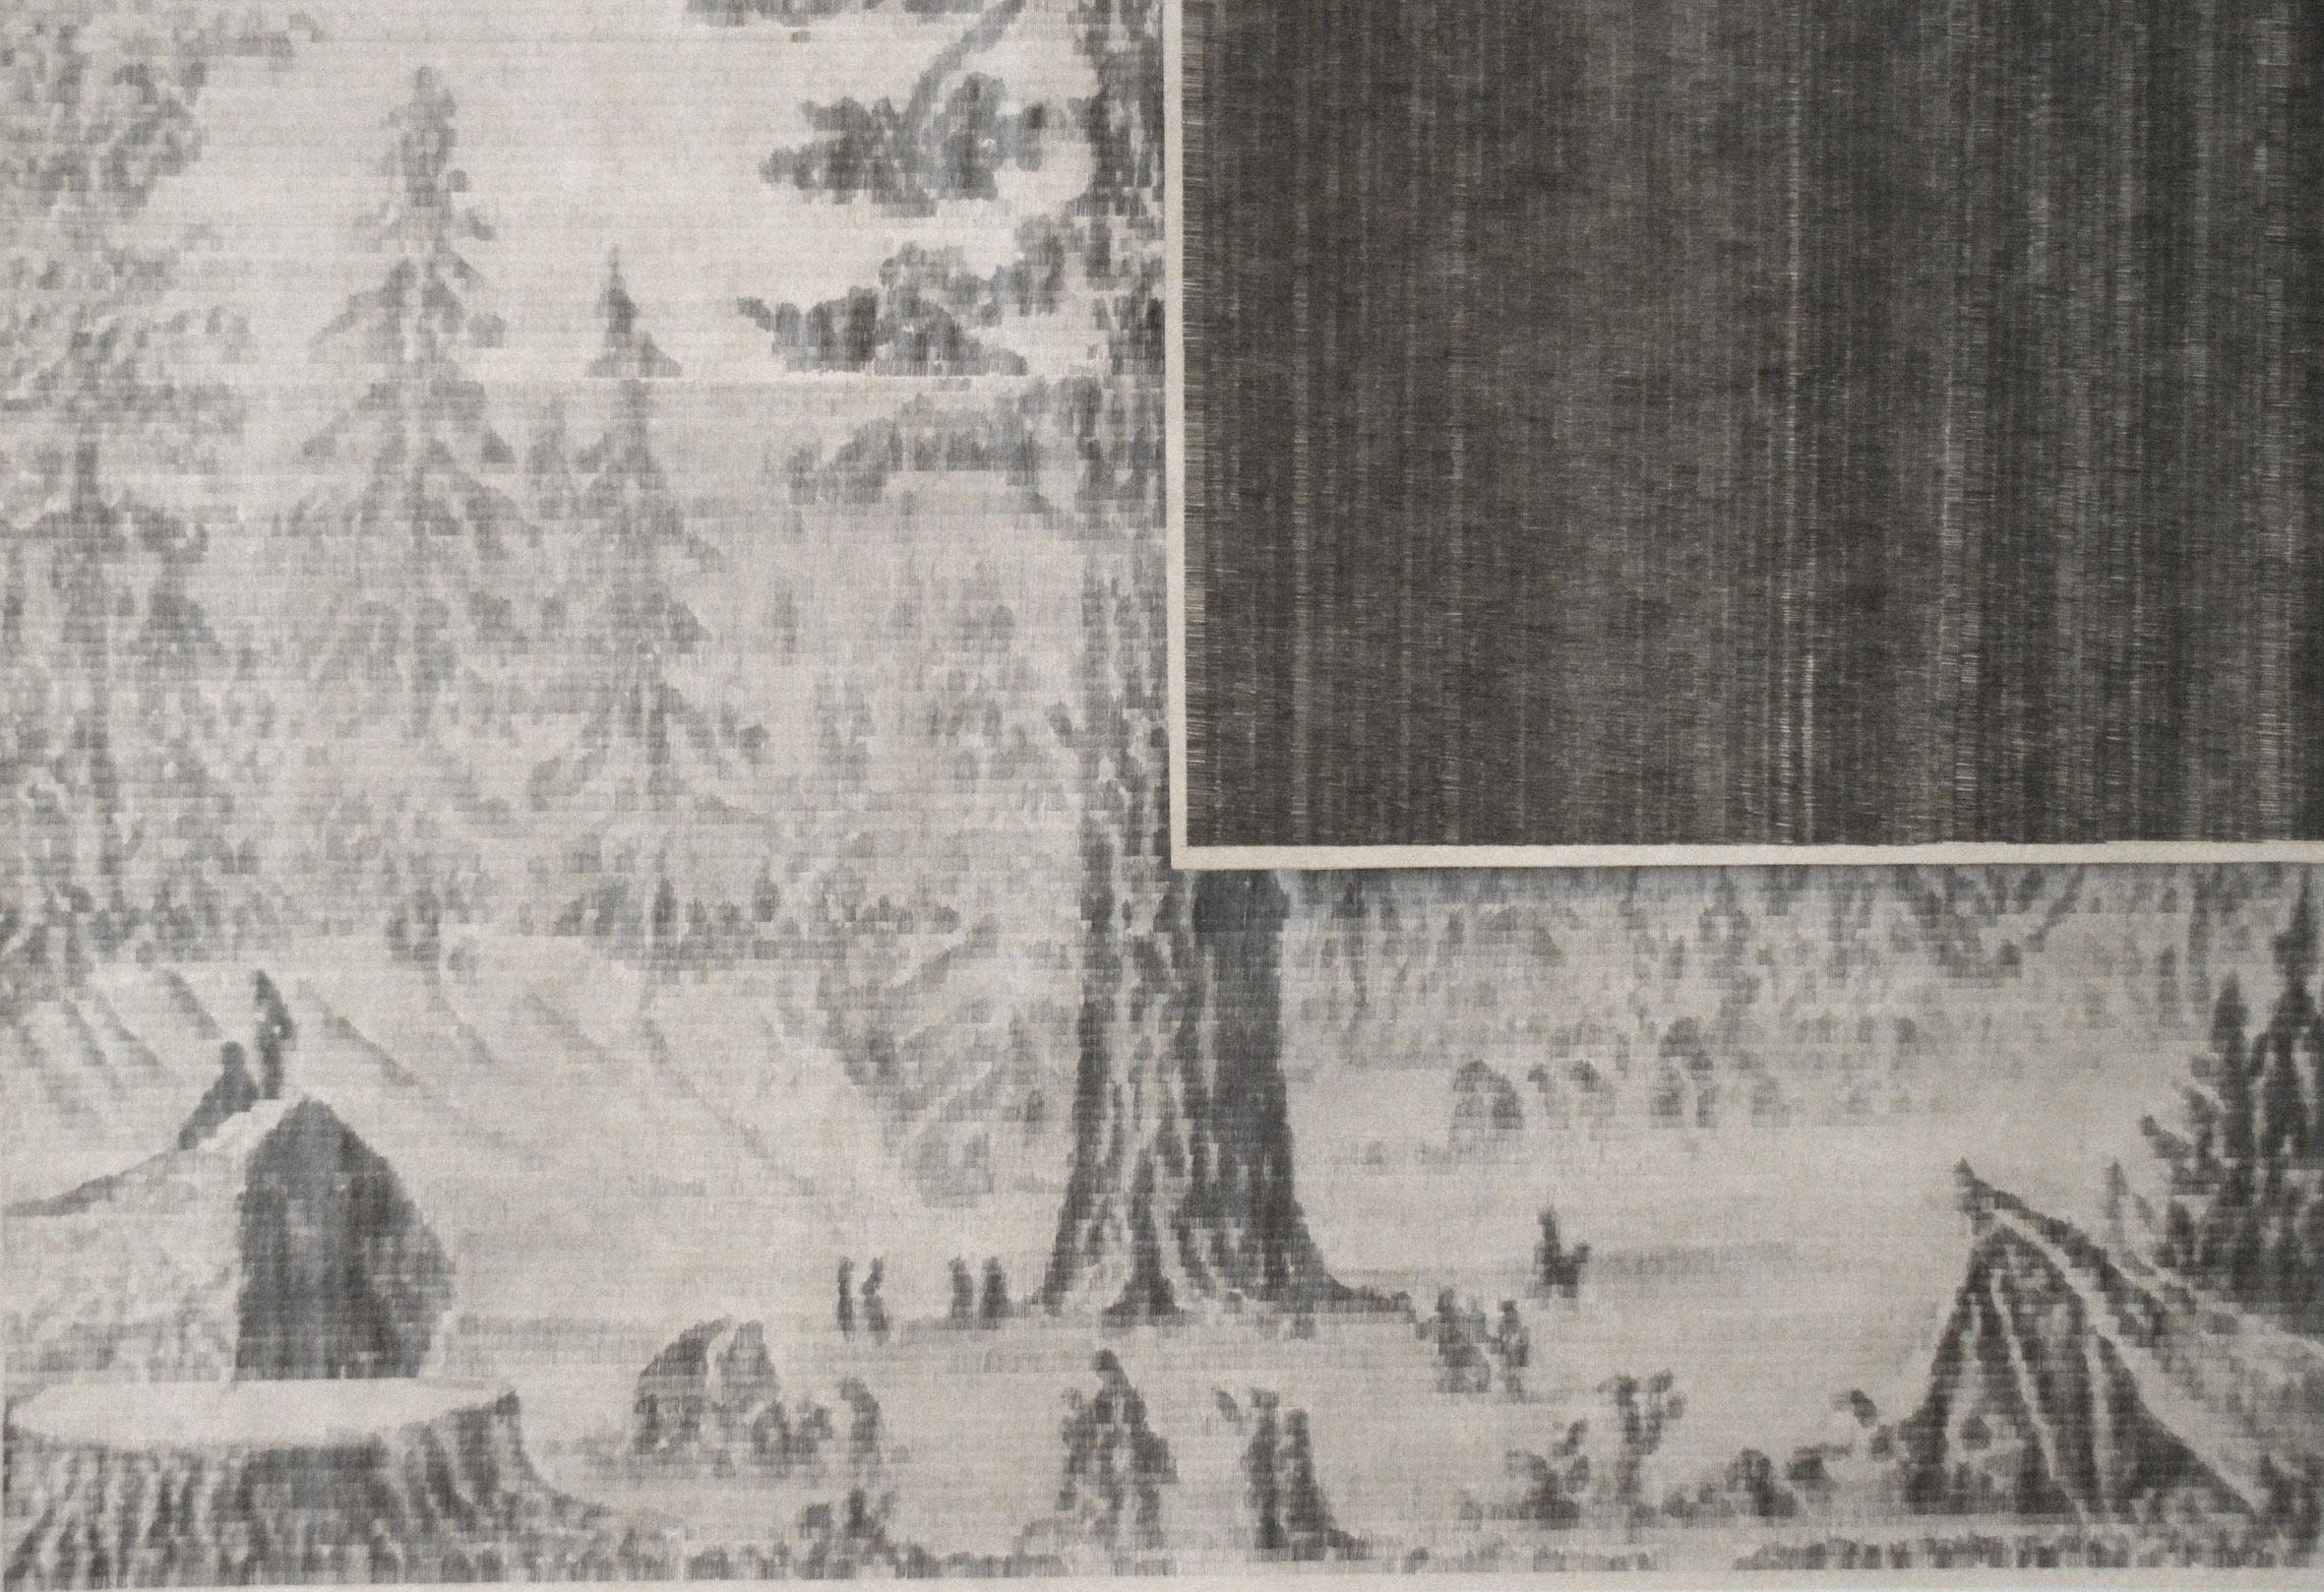 Arbol (detail)